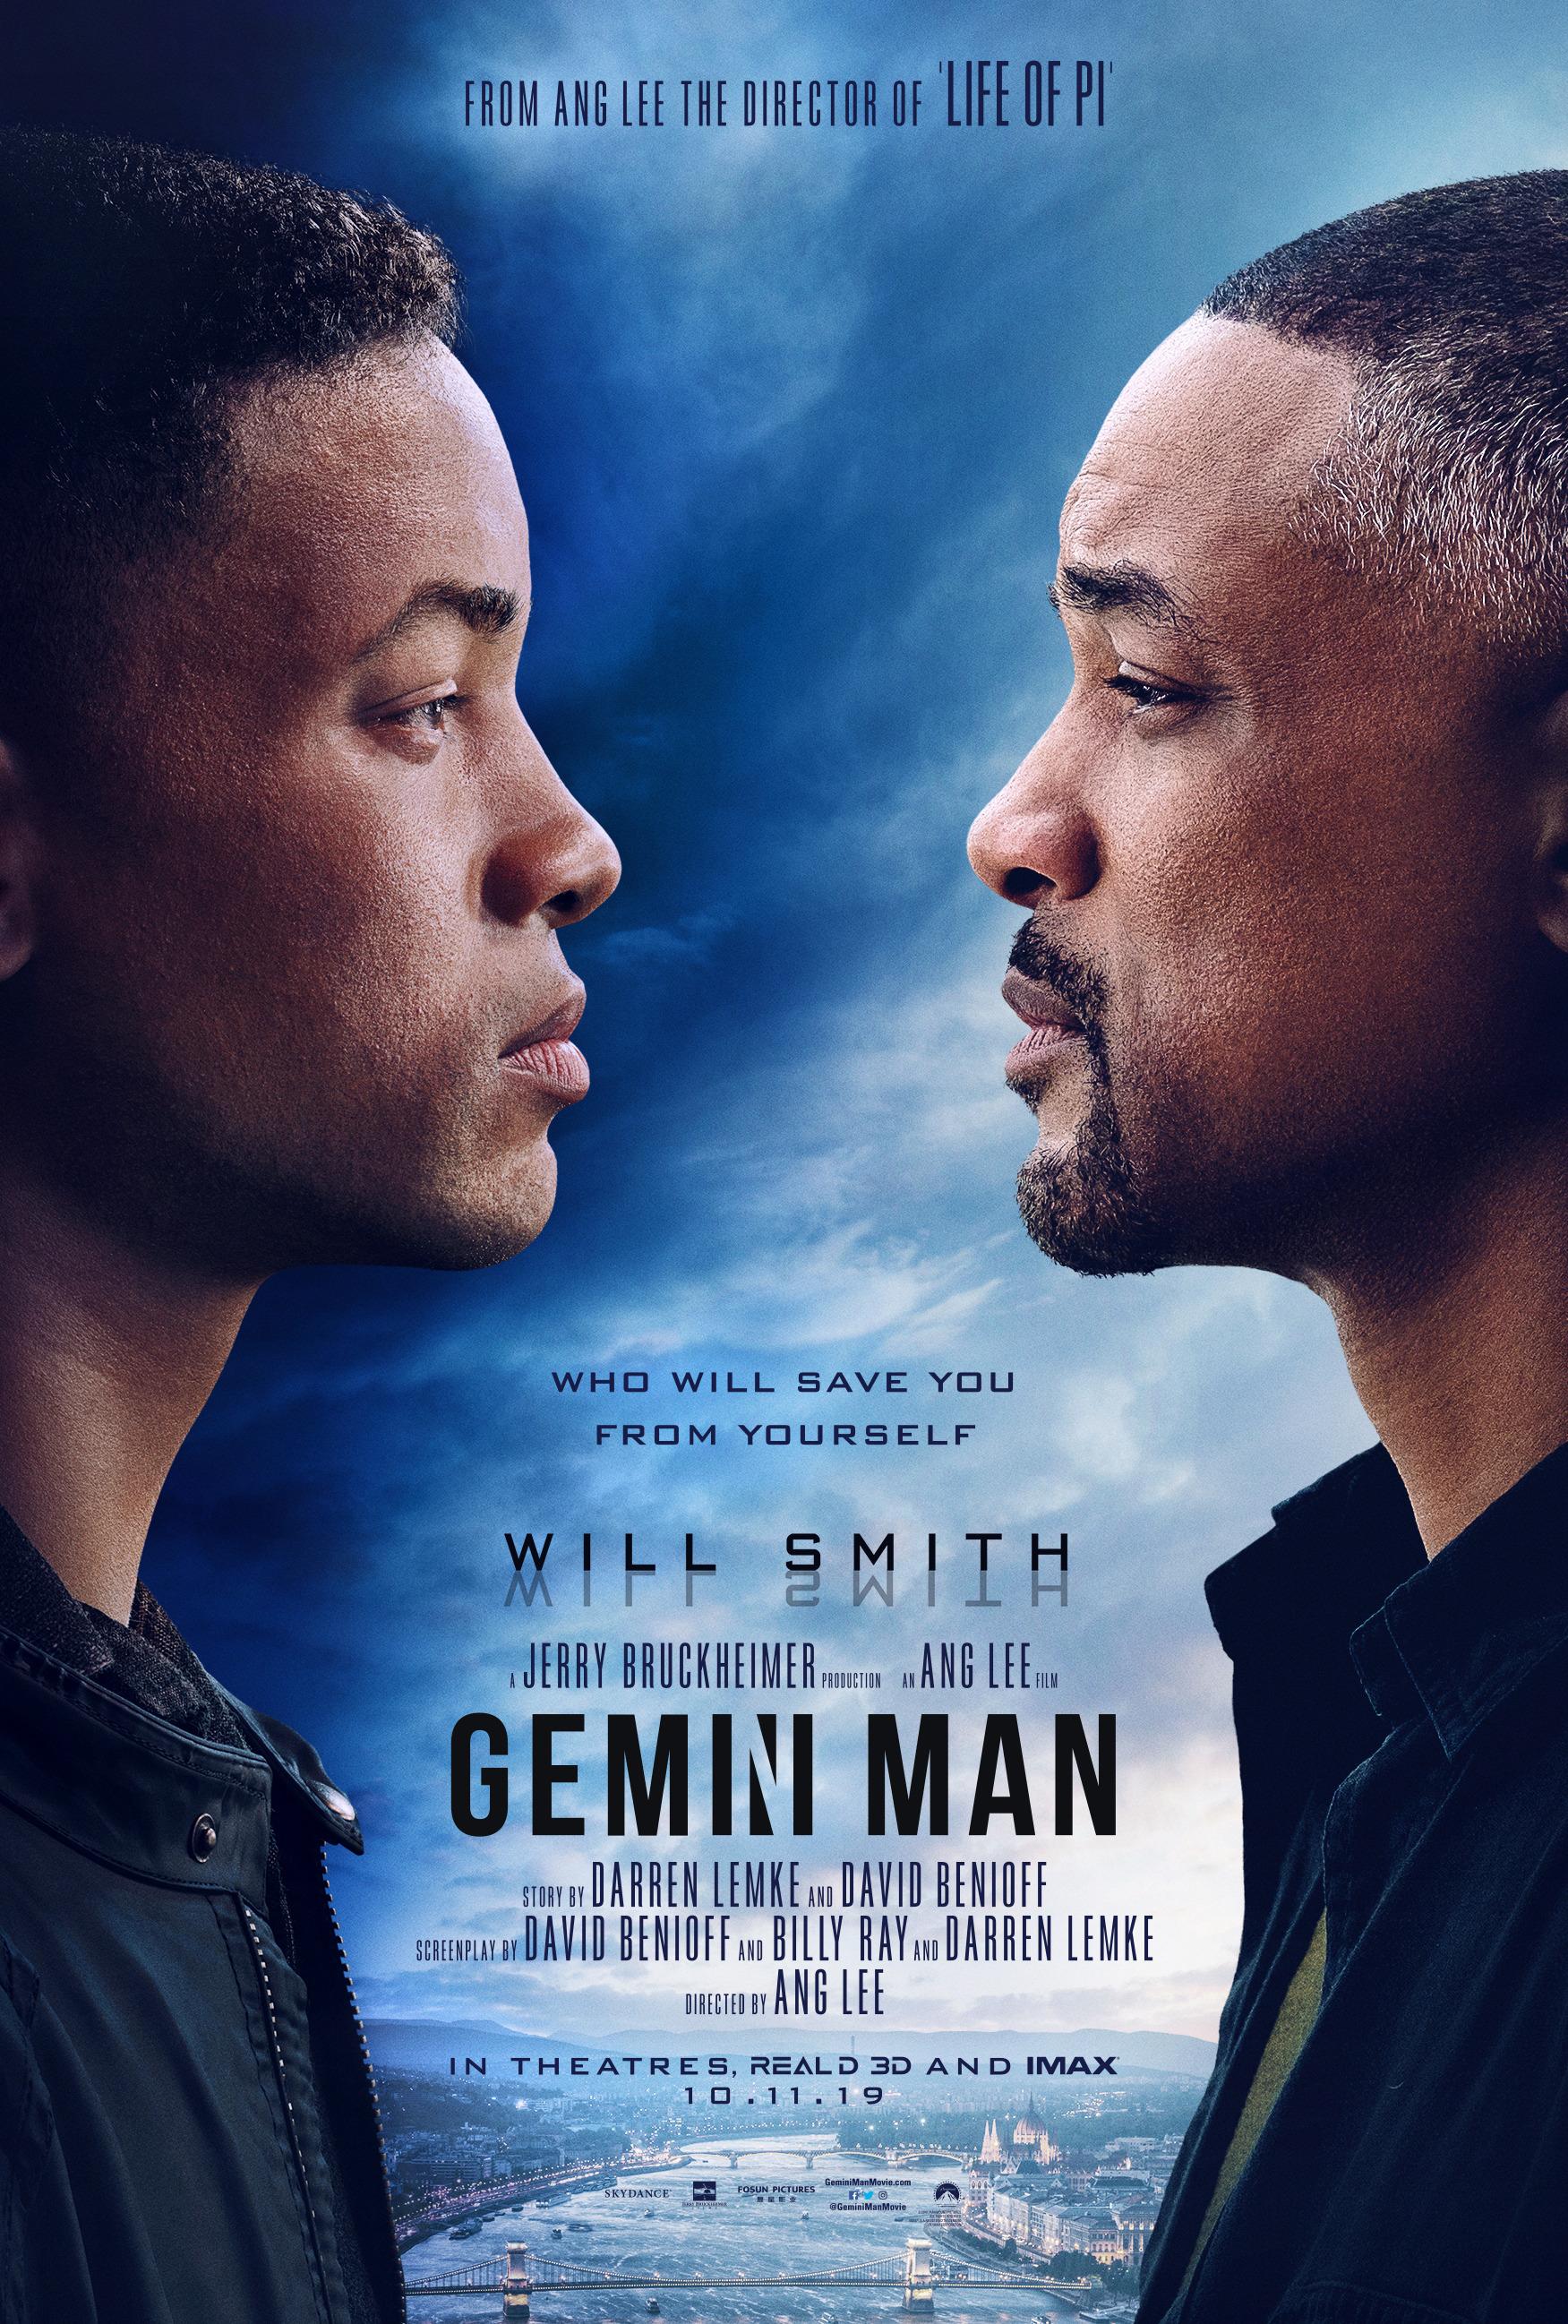 szmk_gemini_man_will_smith_ang_lee_1.jpg